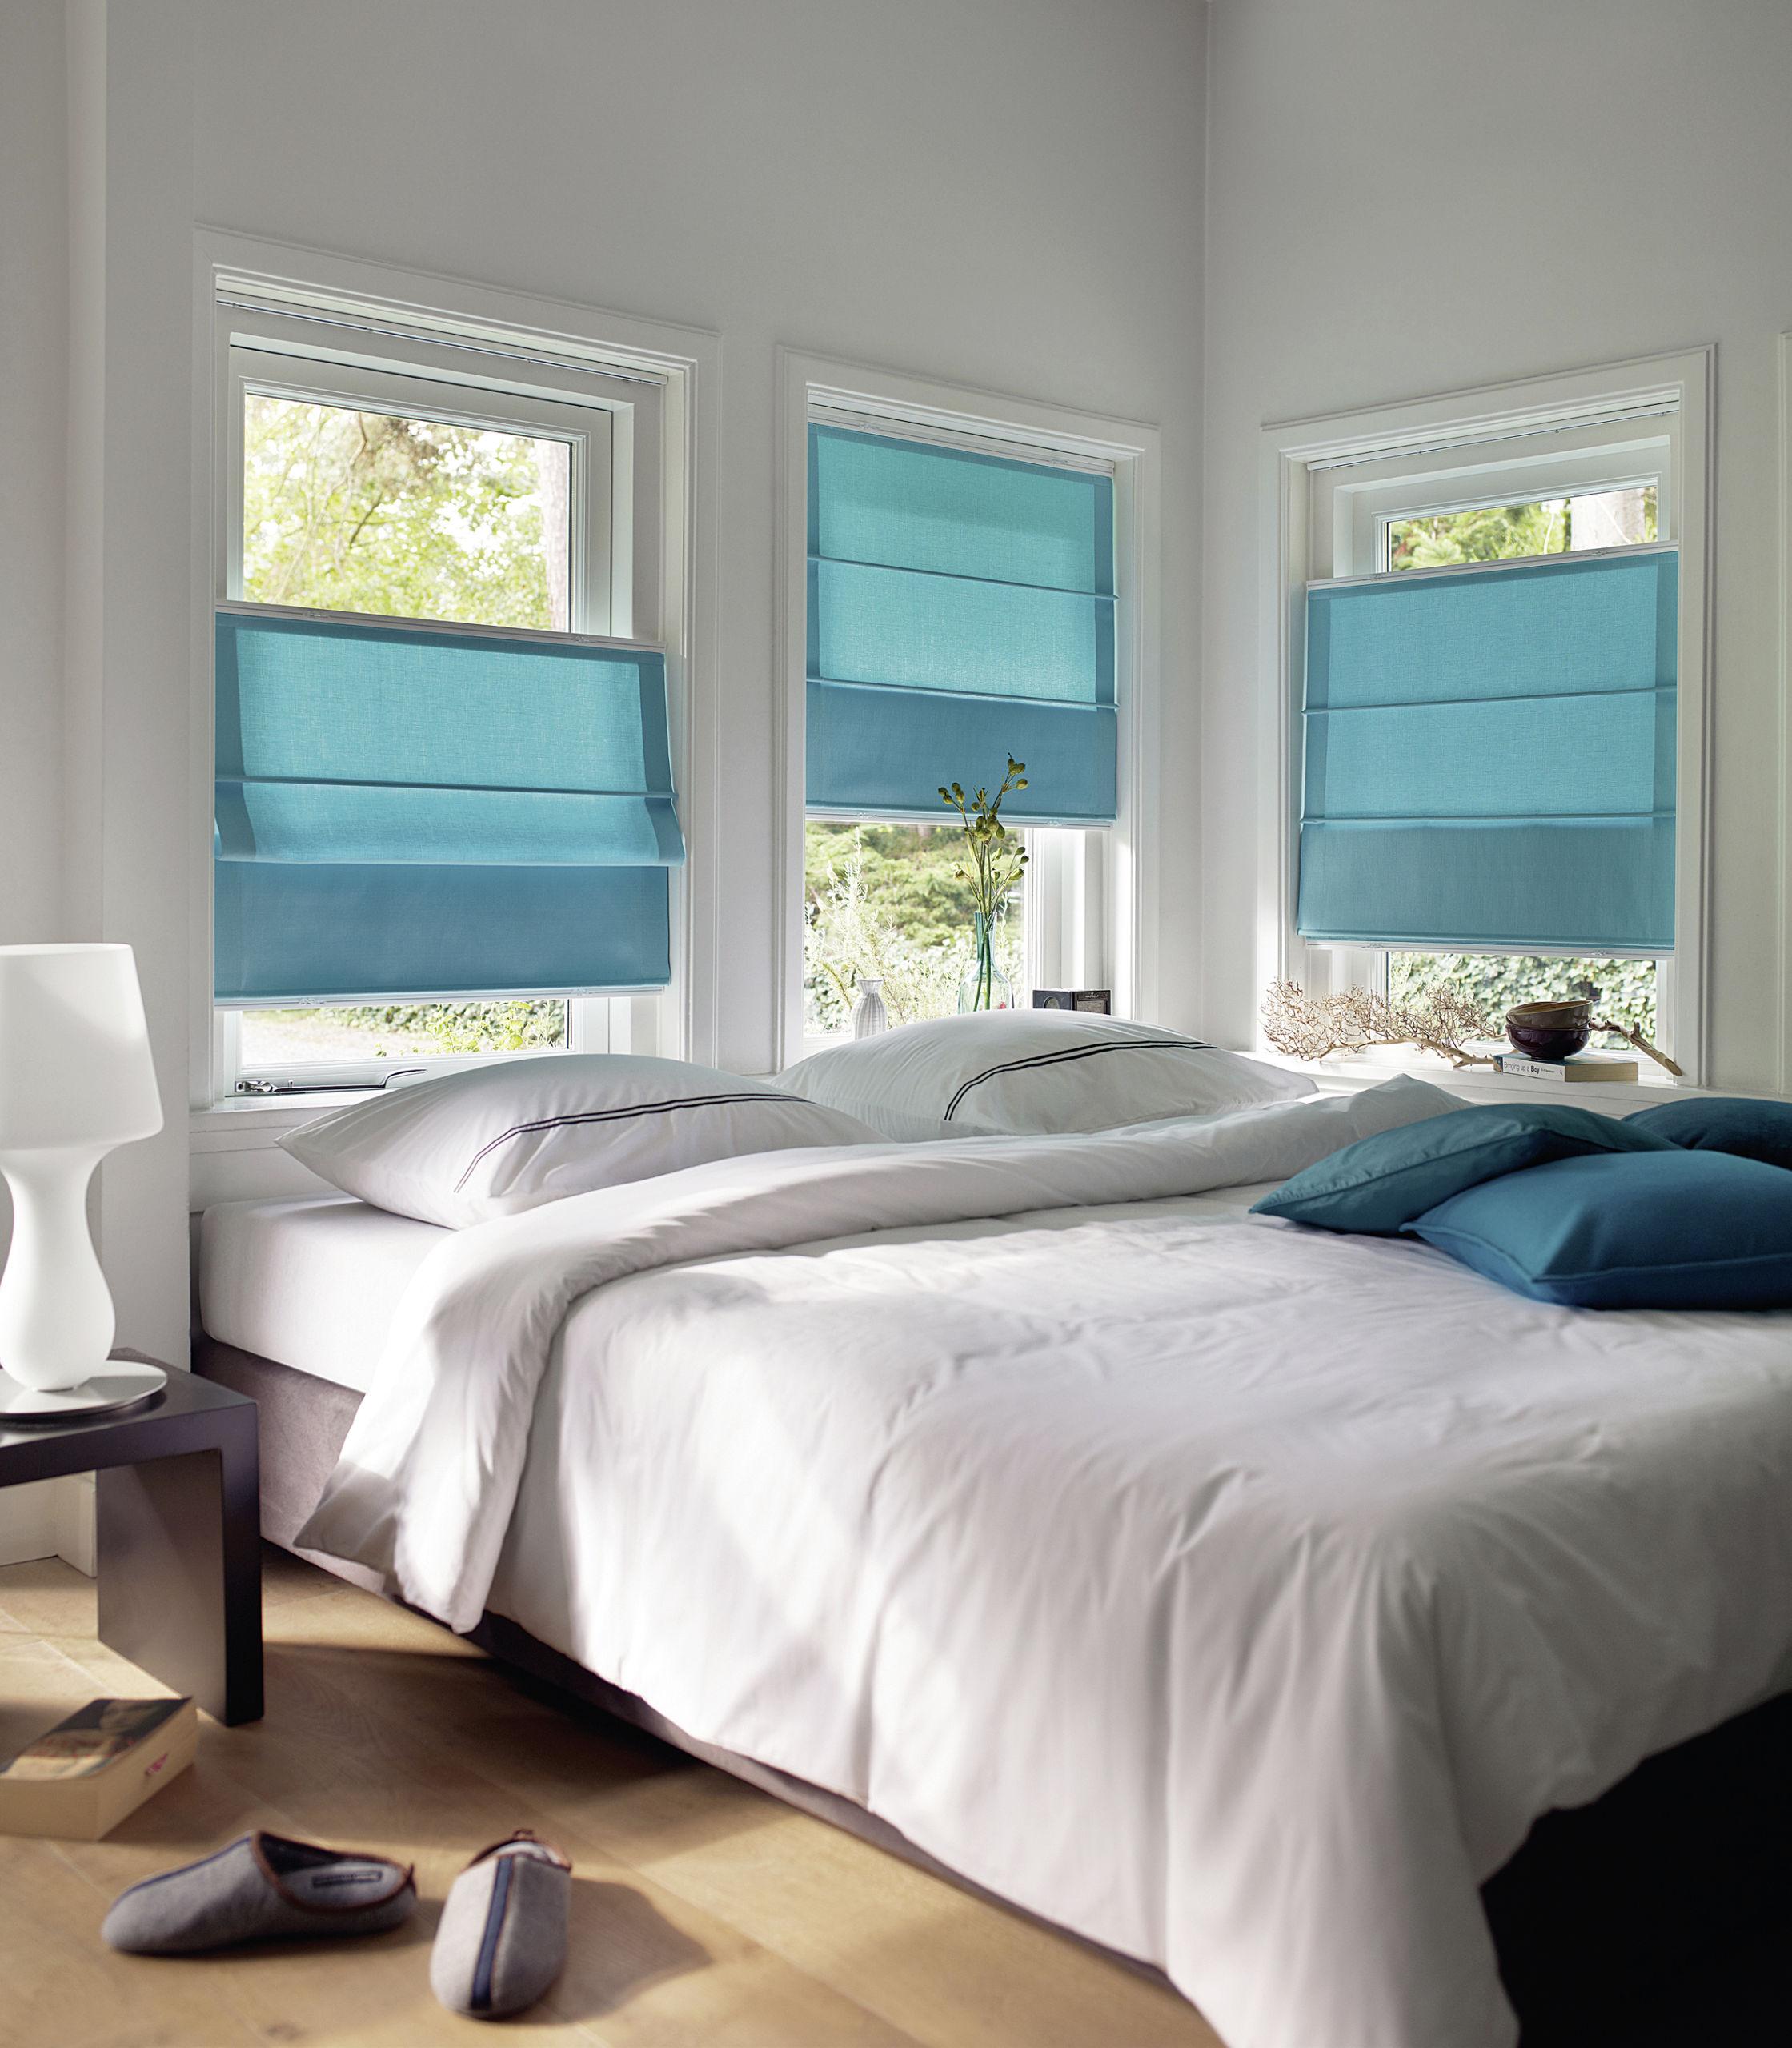 raffrollo blau cool raffrollo nhanleitung nautisch stoff h thema blau with raffrollo blau. Black Bedroom Furniture Sets. Home Design Ideas